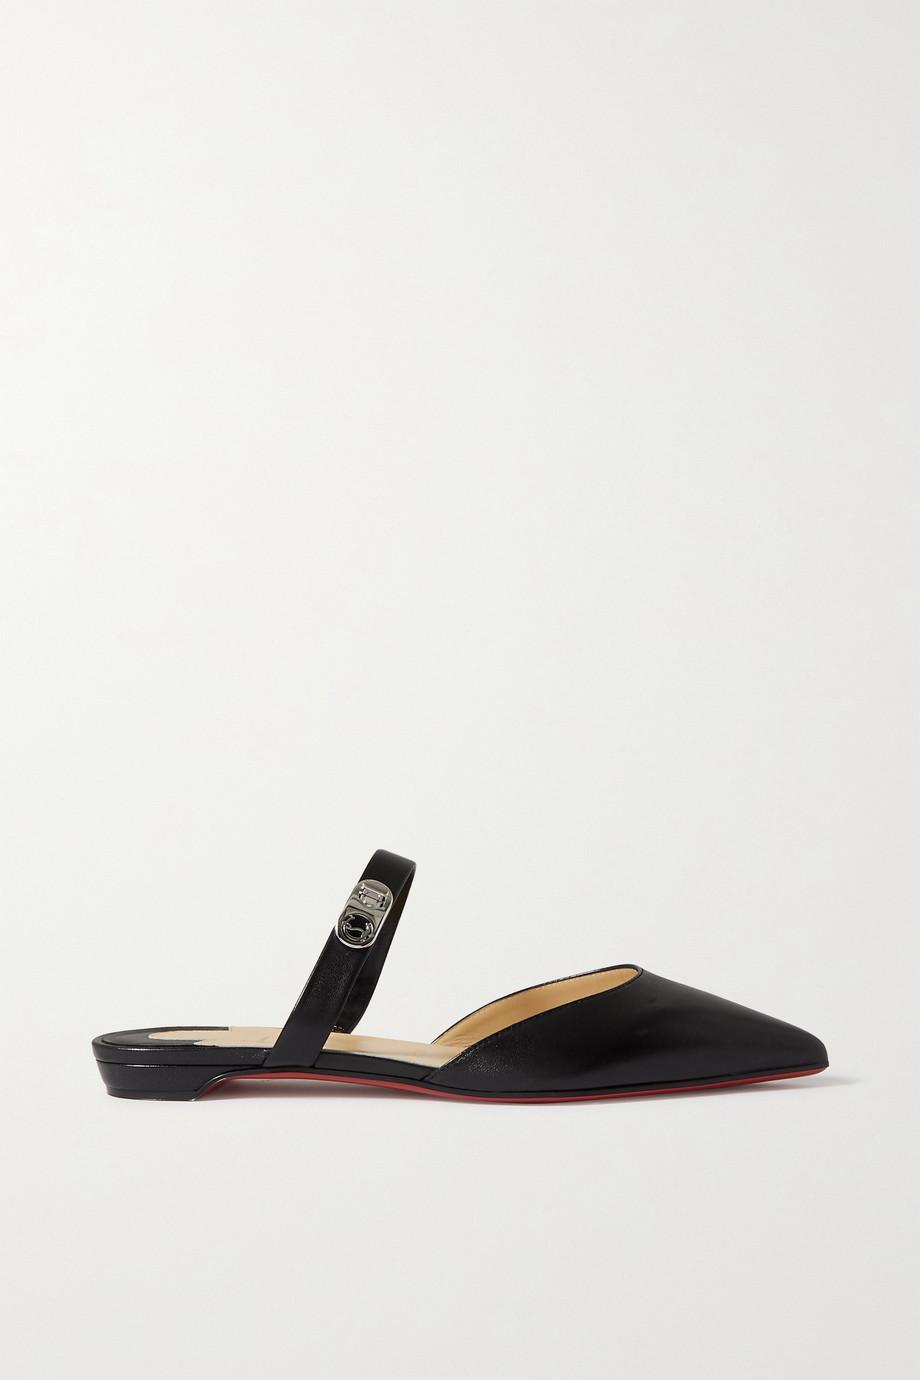 Christian Louboutin Choc Lock leather point-toe flats